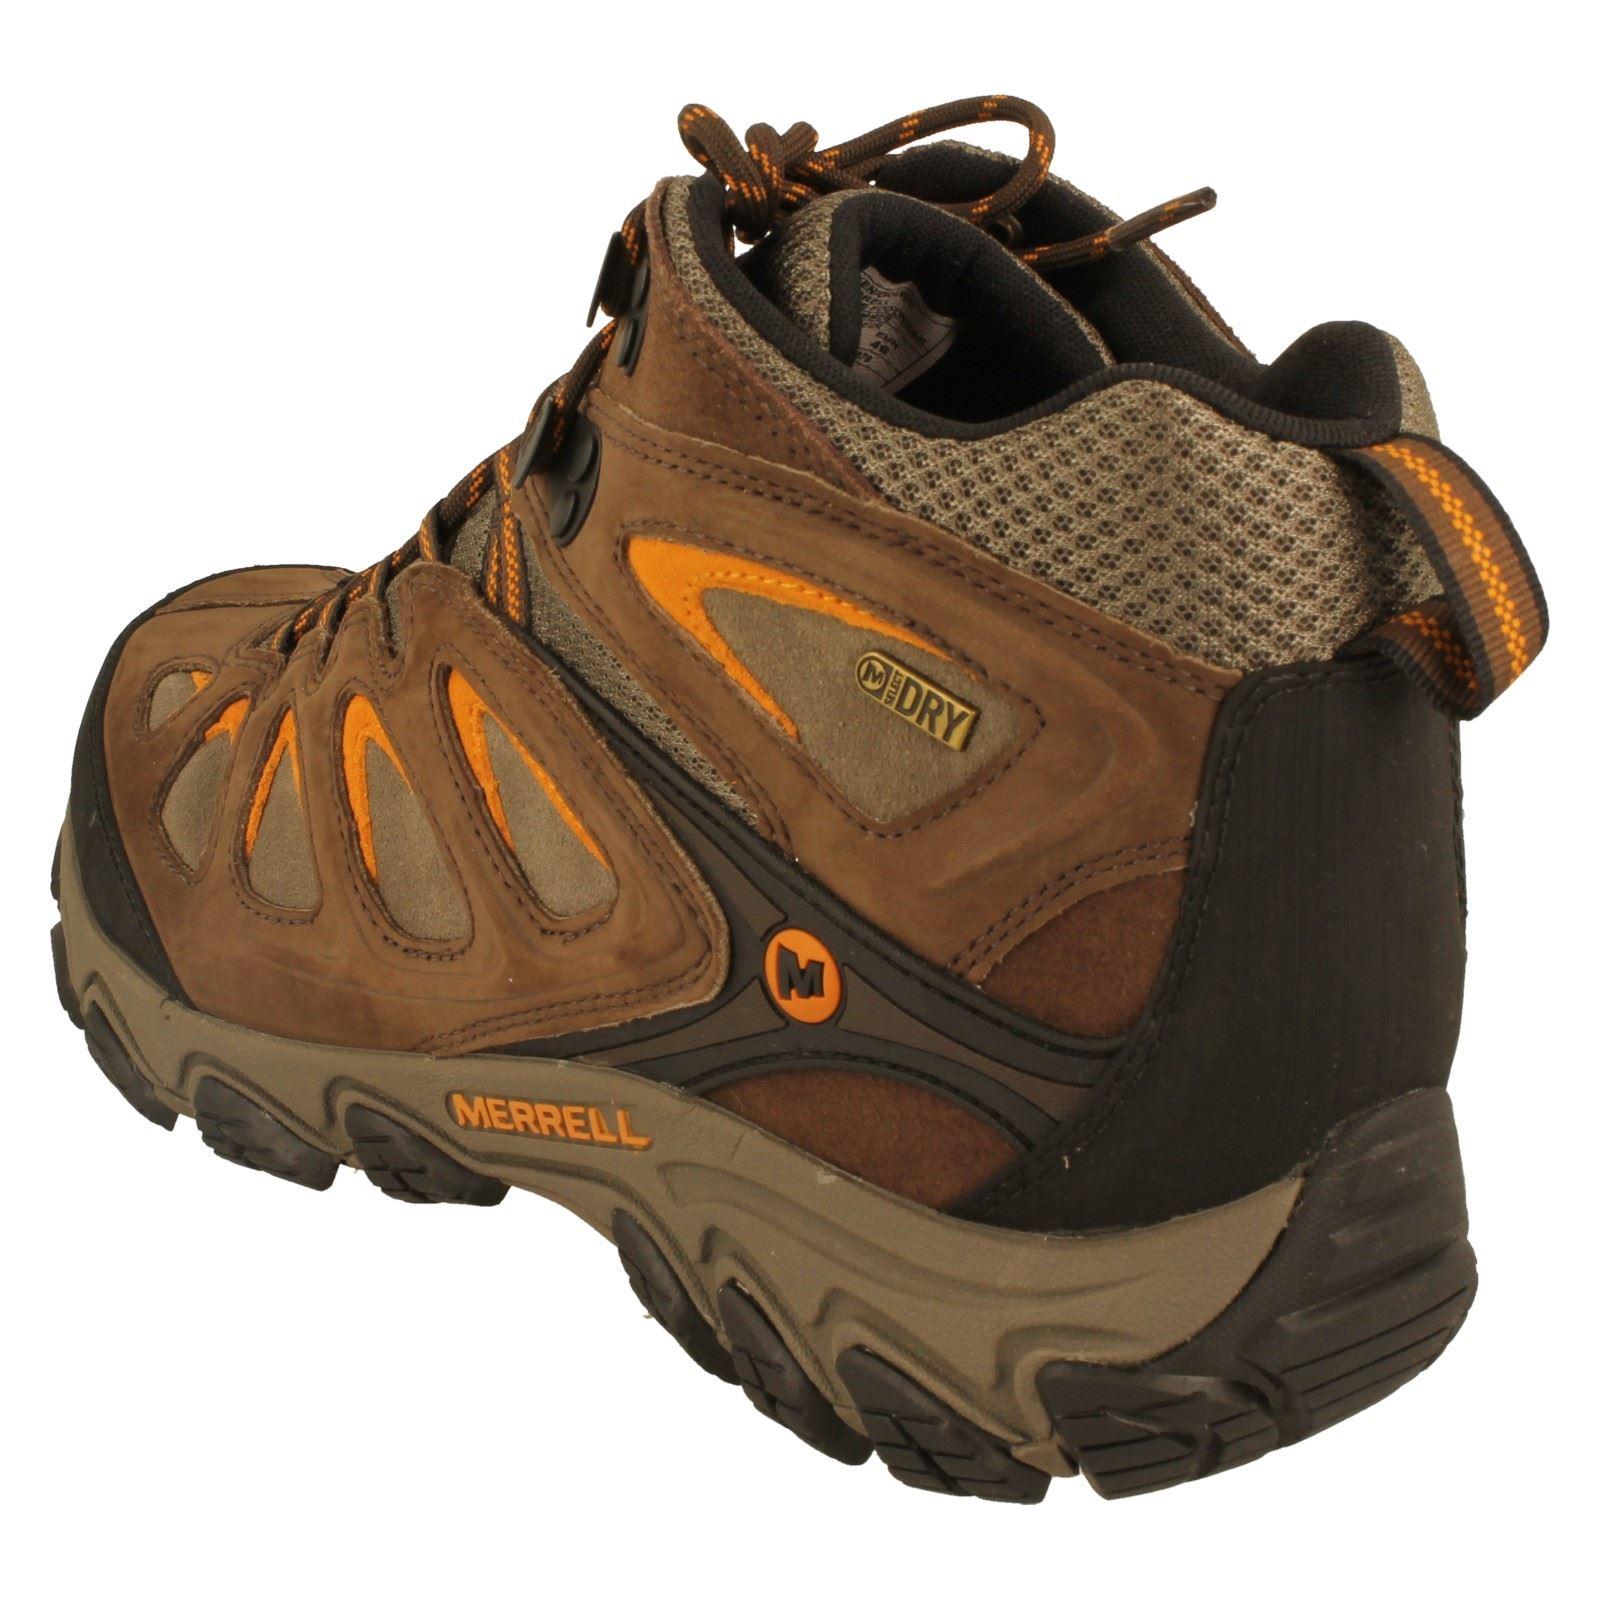 Mens Merrell Walking Boots Pulsate Mid Waterproof - W